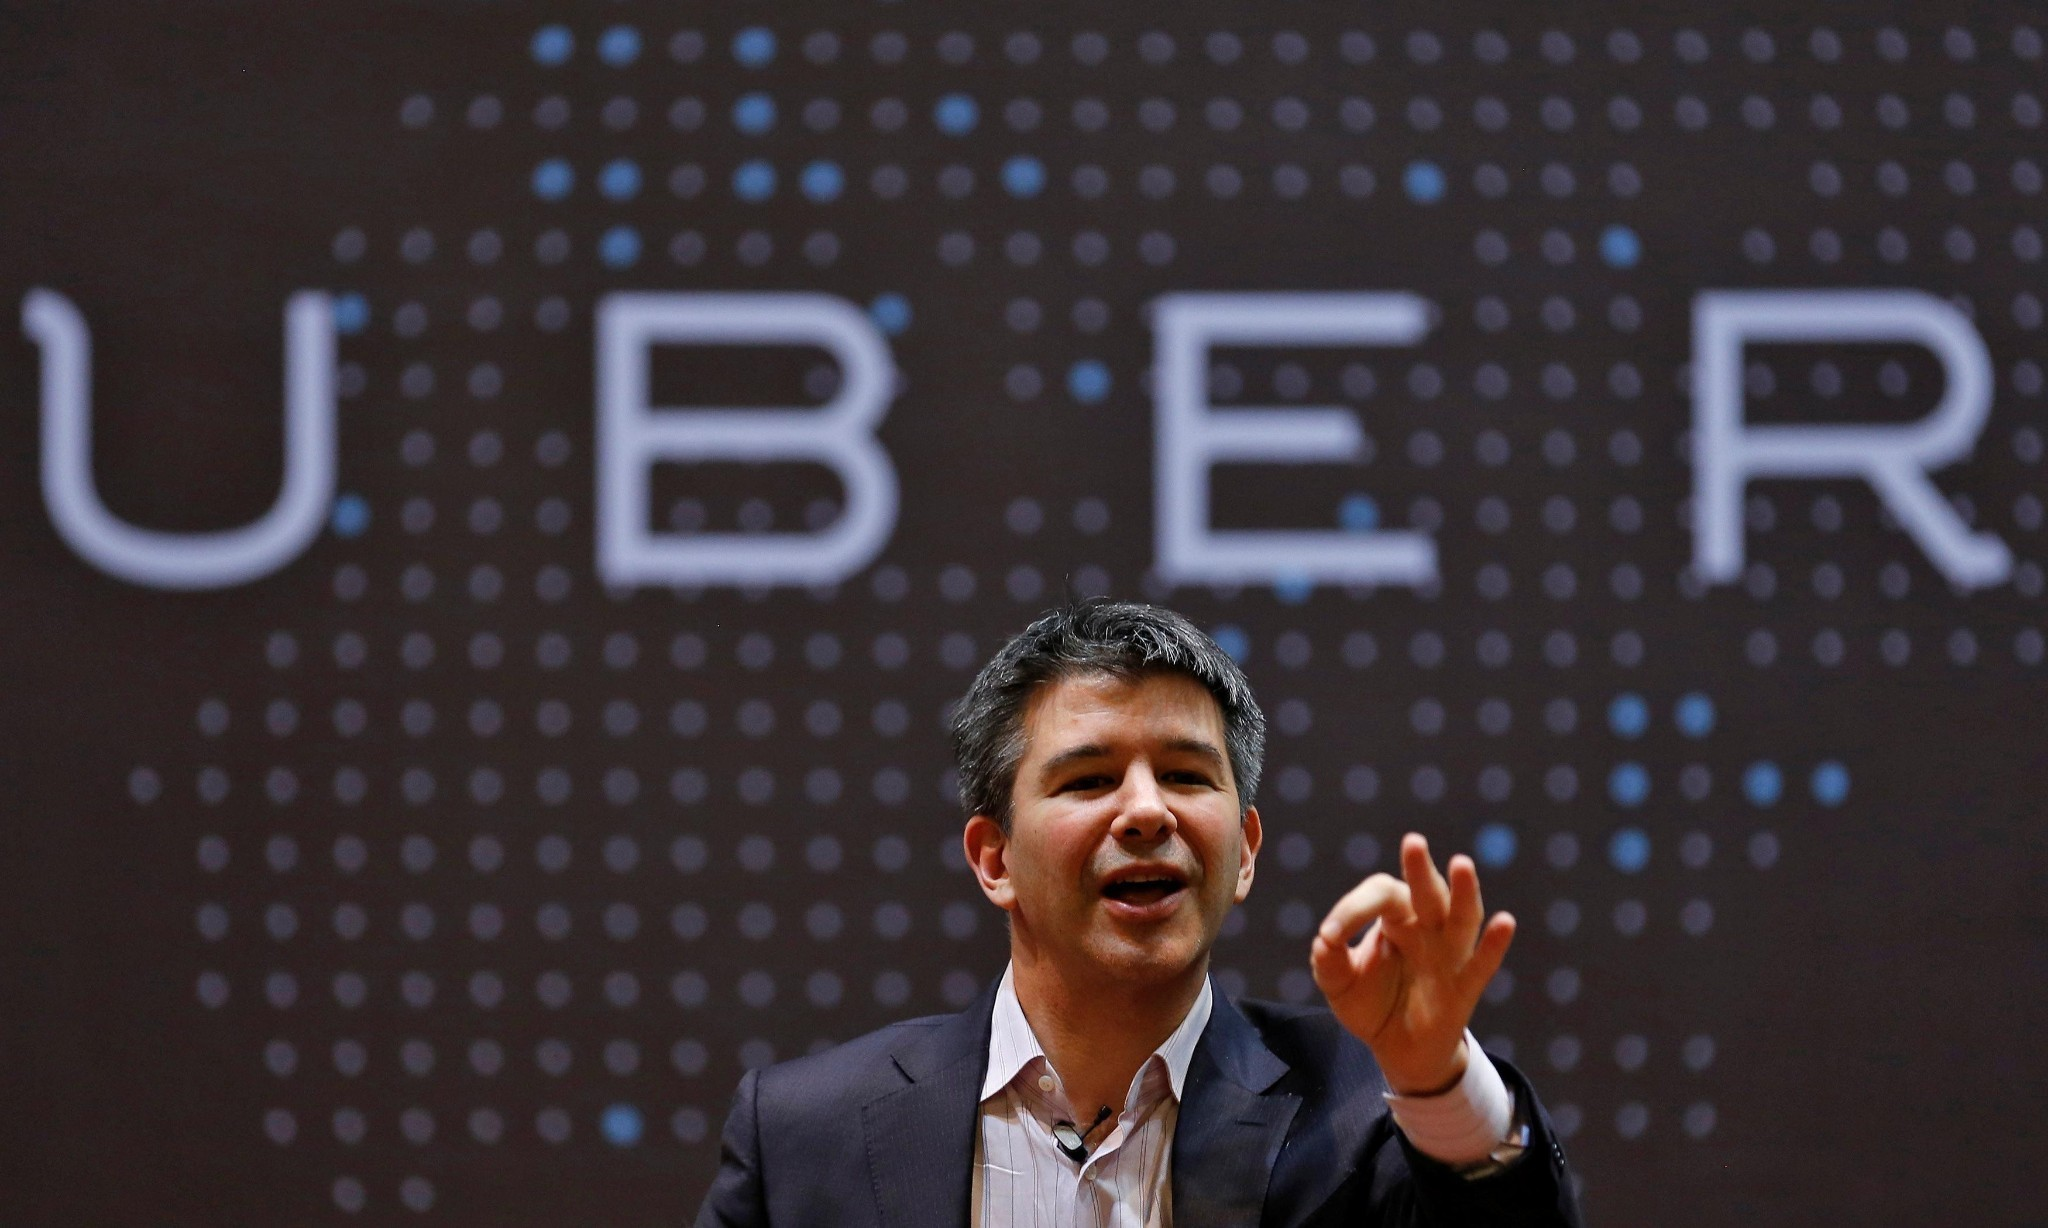 Uber executives defend embattled CEO in latest damage-control effort